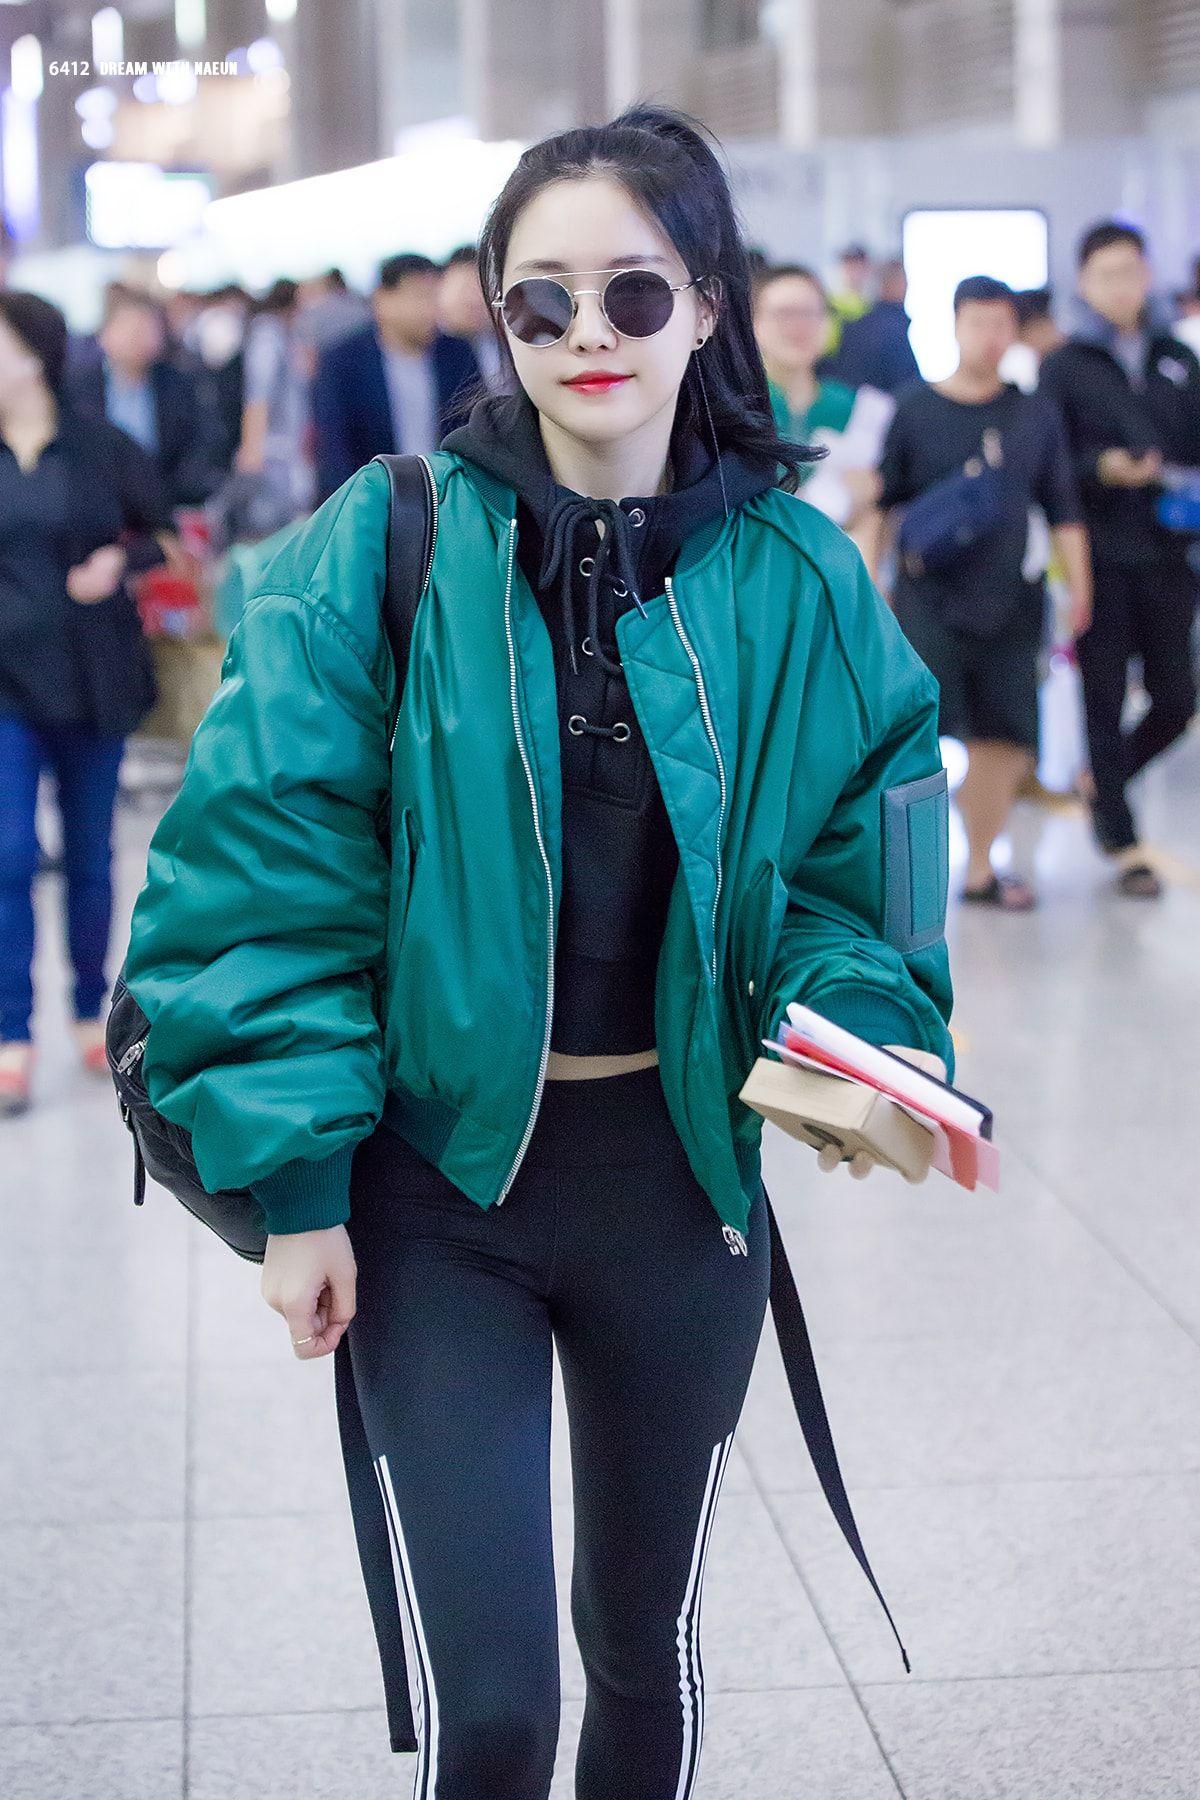 Image Result For Naeun Apink 2018 Korean Street Fashion Fashion Kpop Fashion